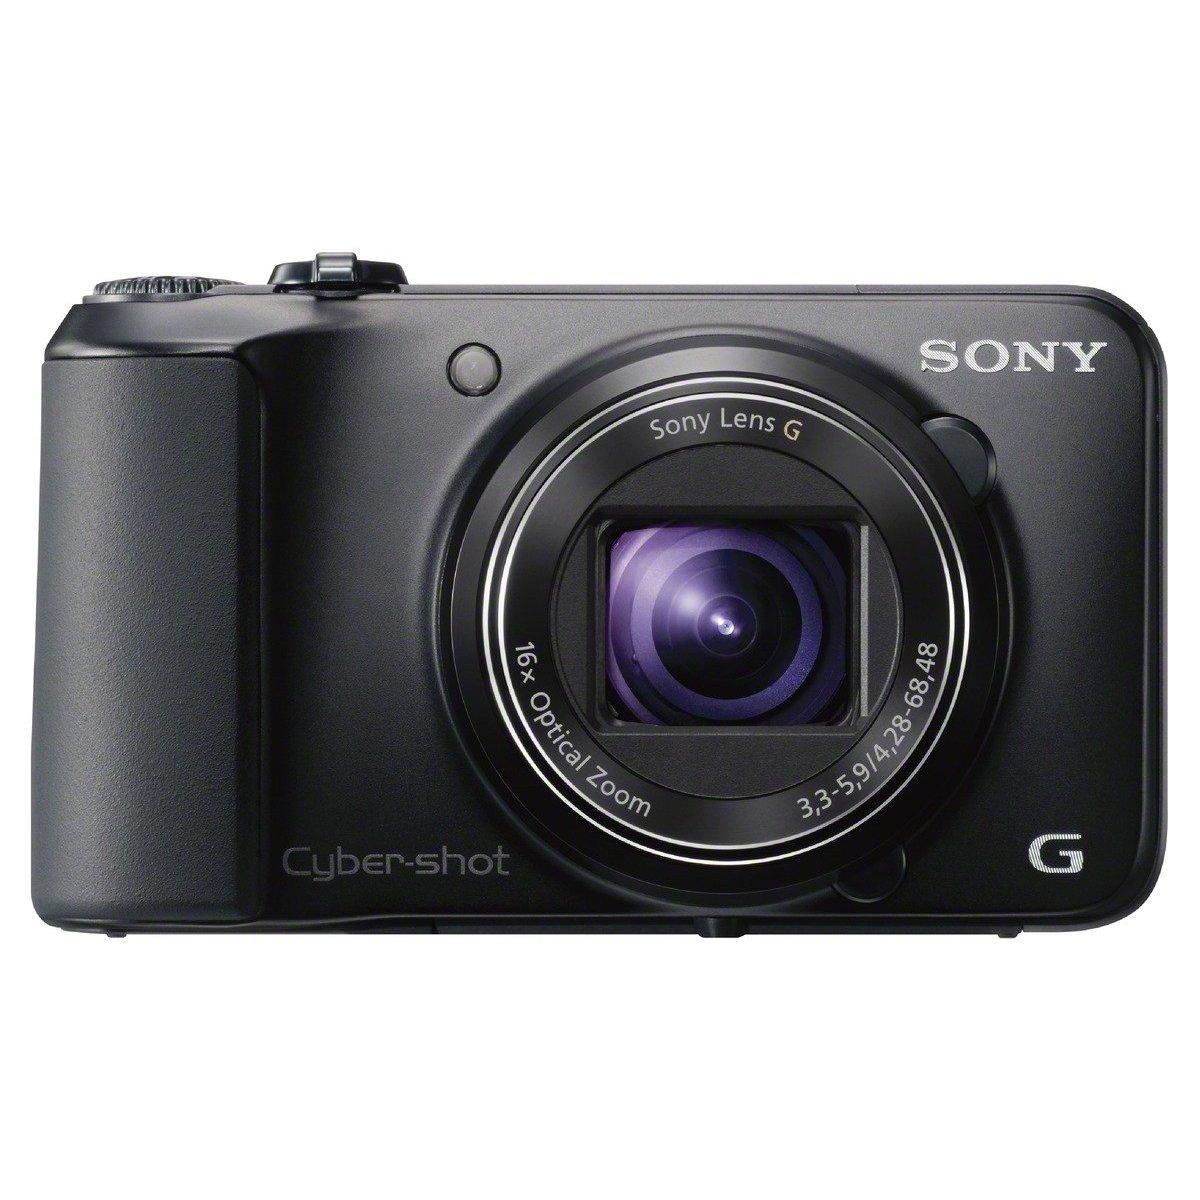 https://thetechjournal.com/wp-content/uploads/images/1203/1331531693-sony-cybershot-dsch90-161-mp-digital-camera-7.jpg